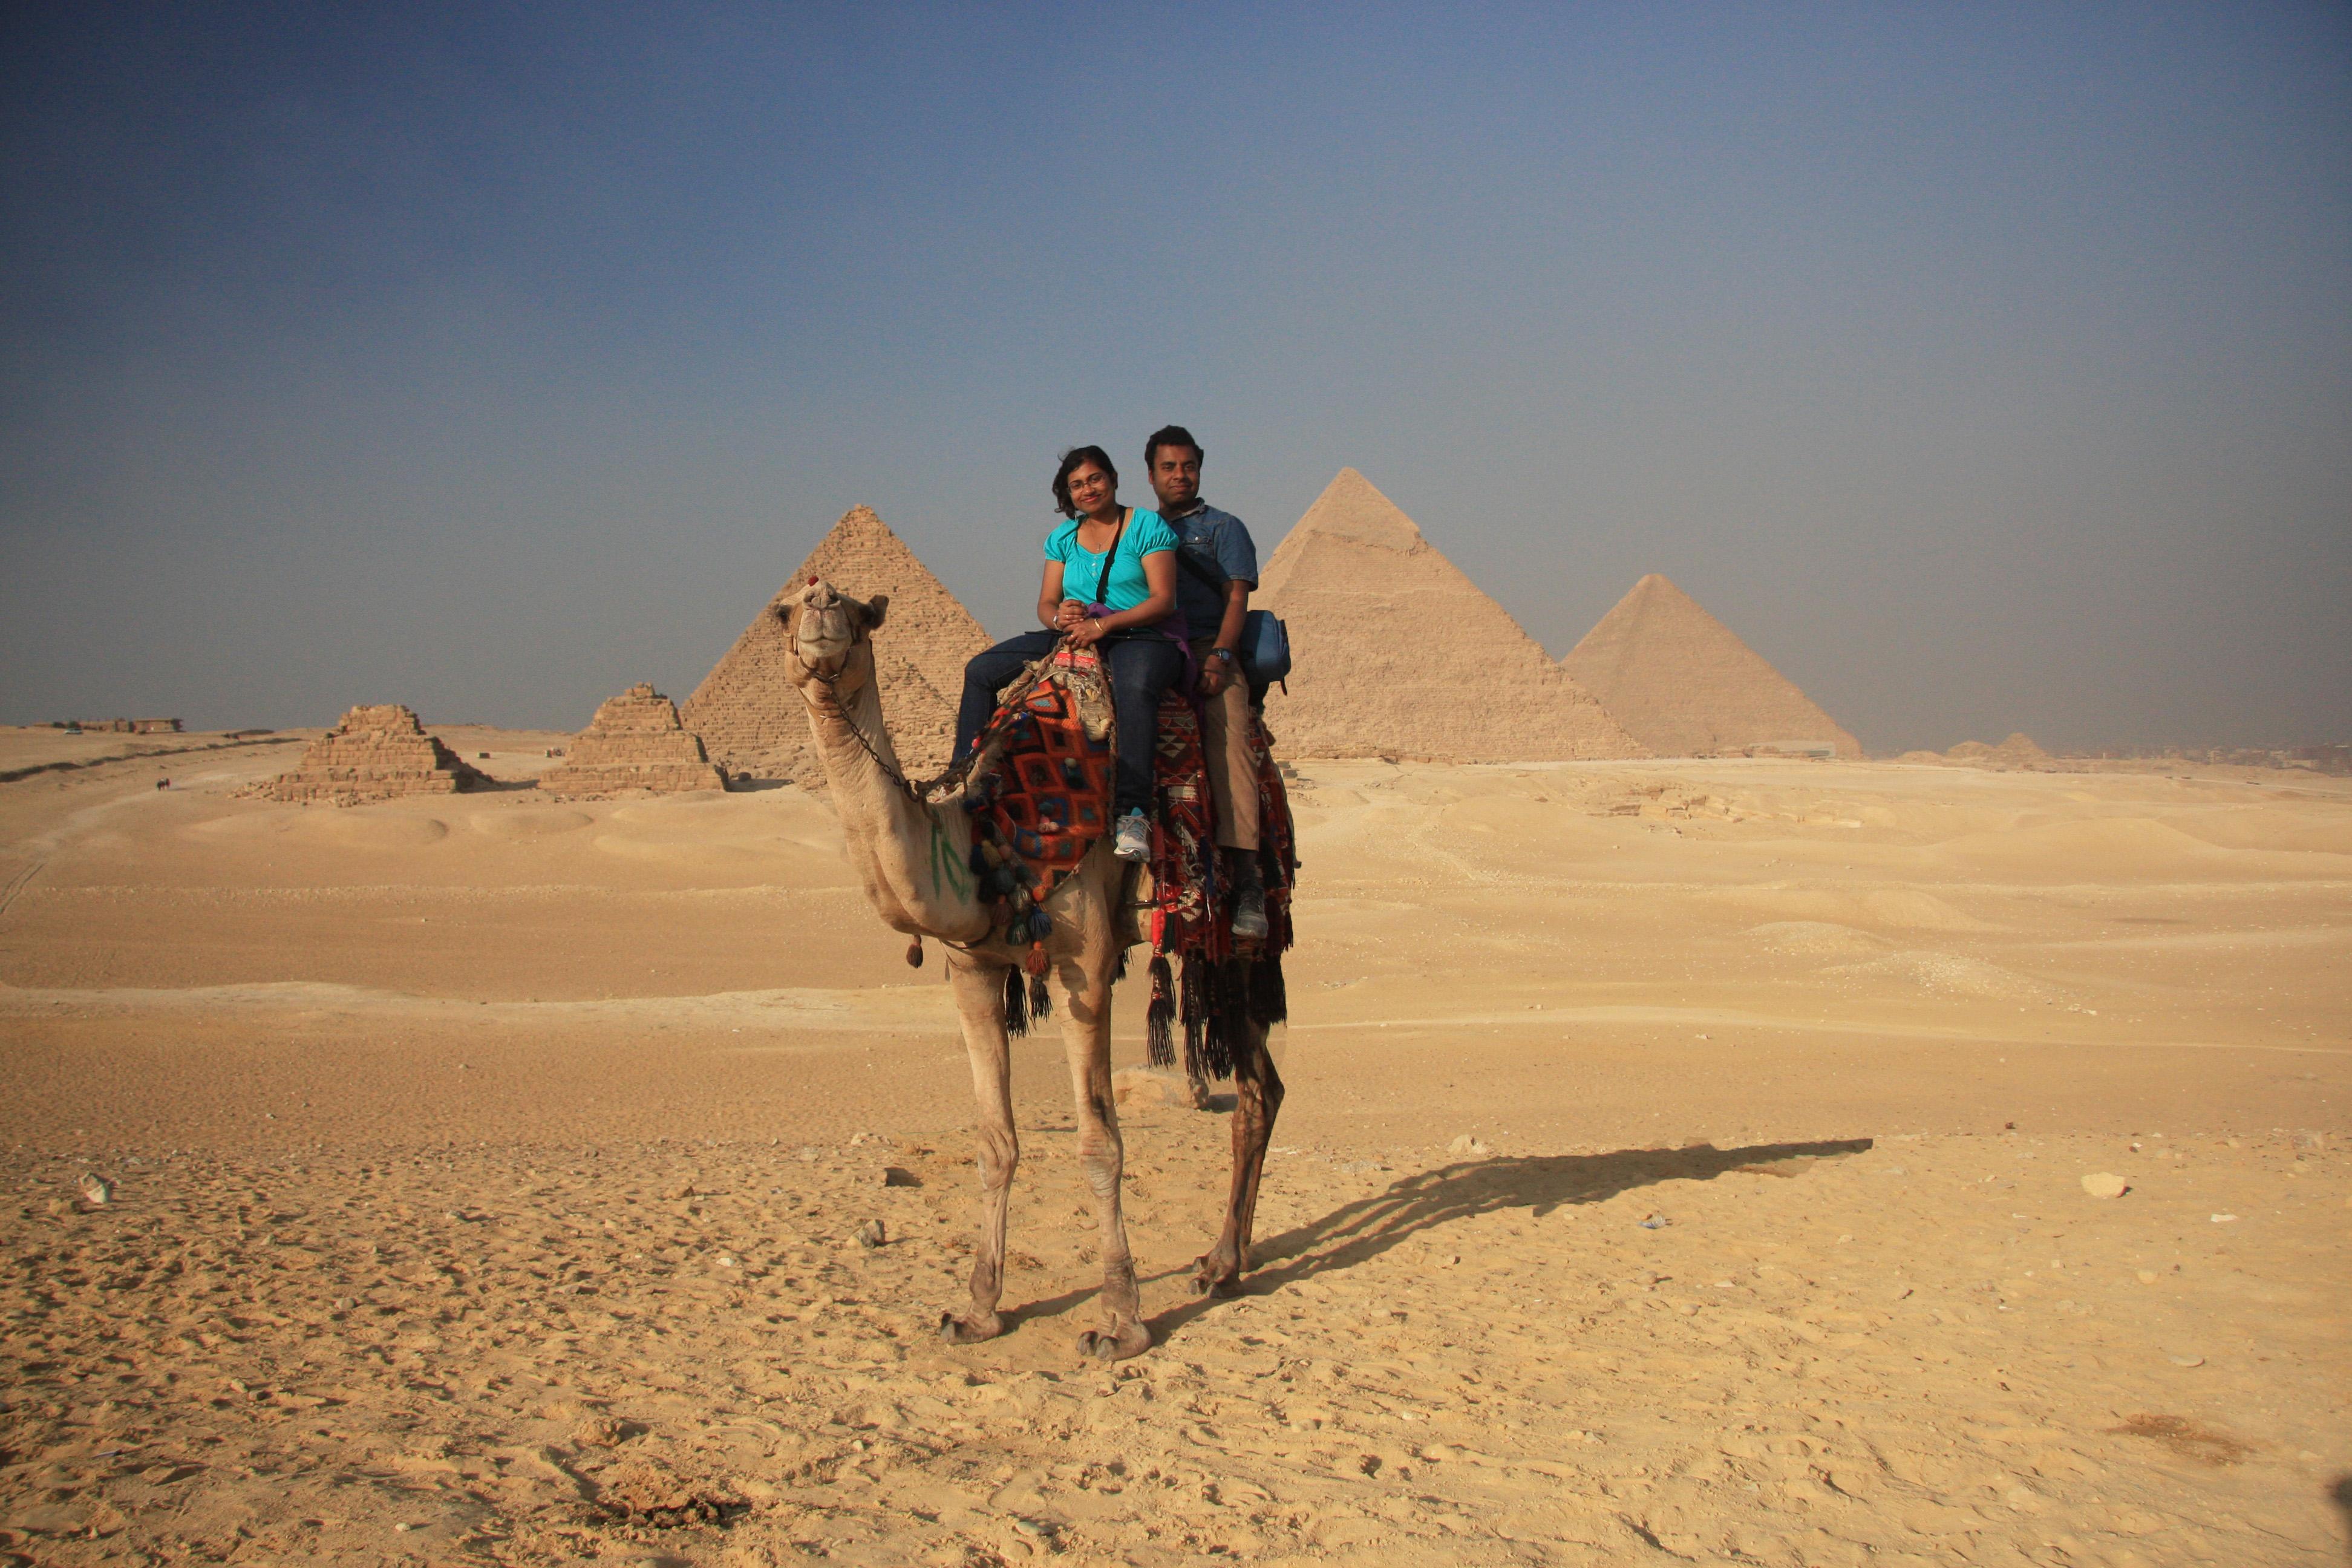 Egypt: Giza plateau